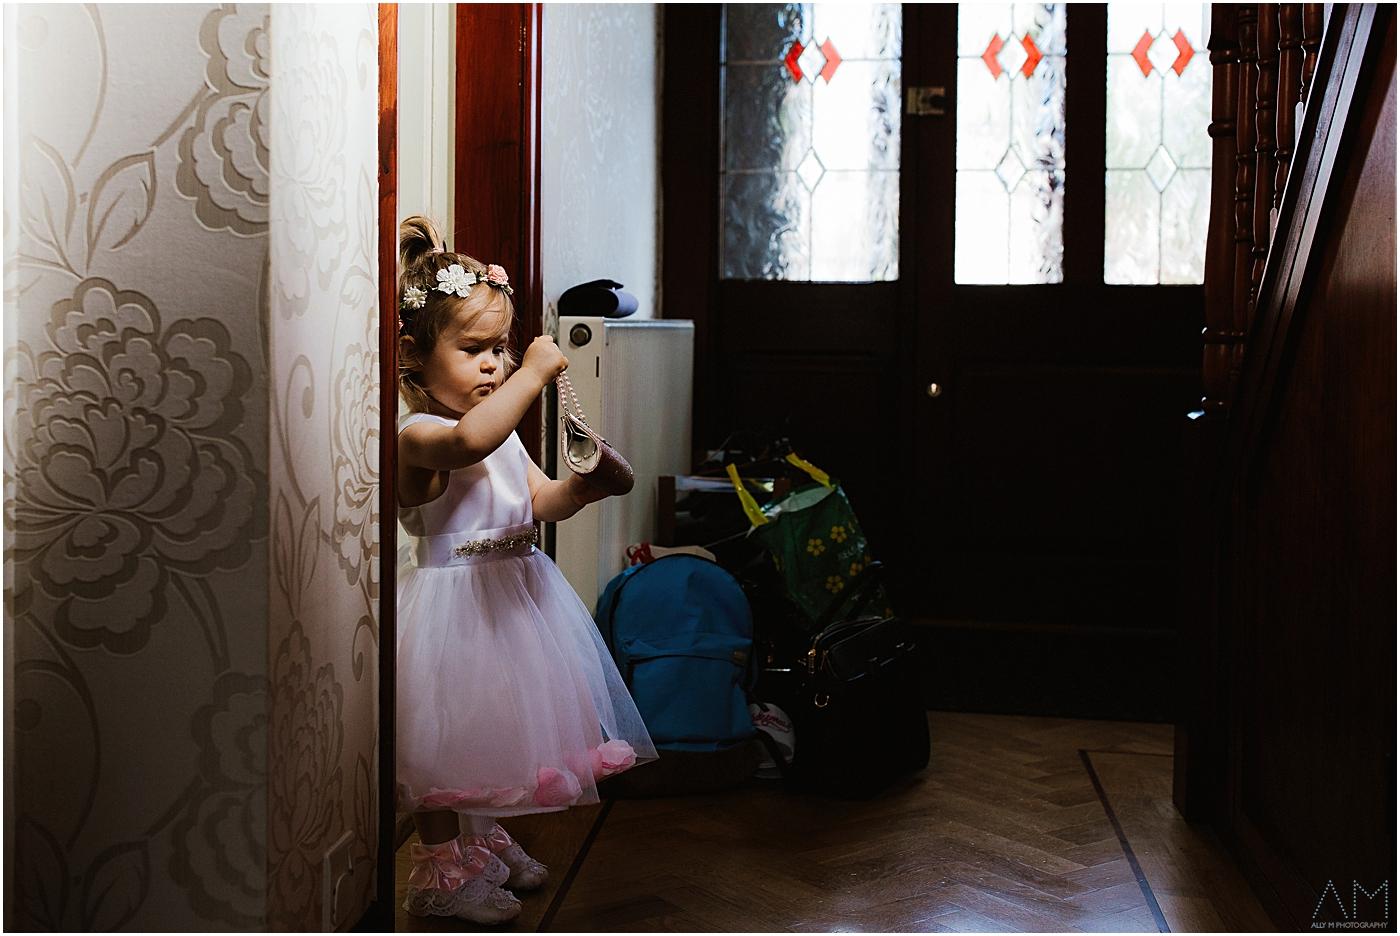 Little girl in her bridesmaids dress